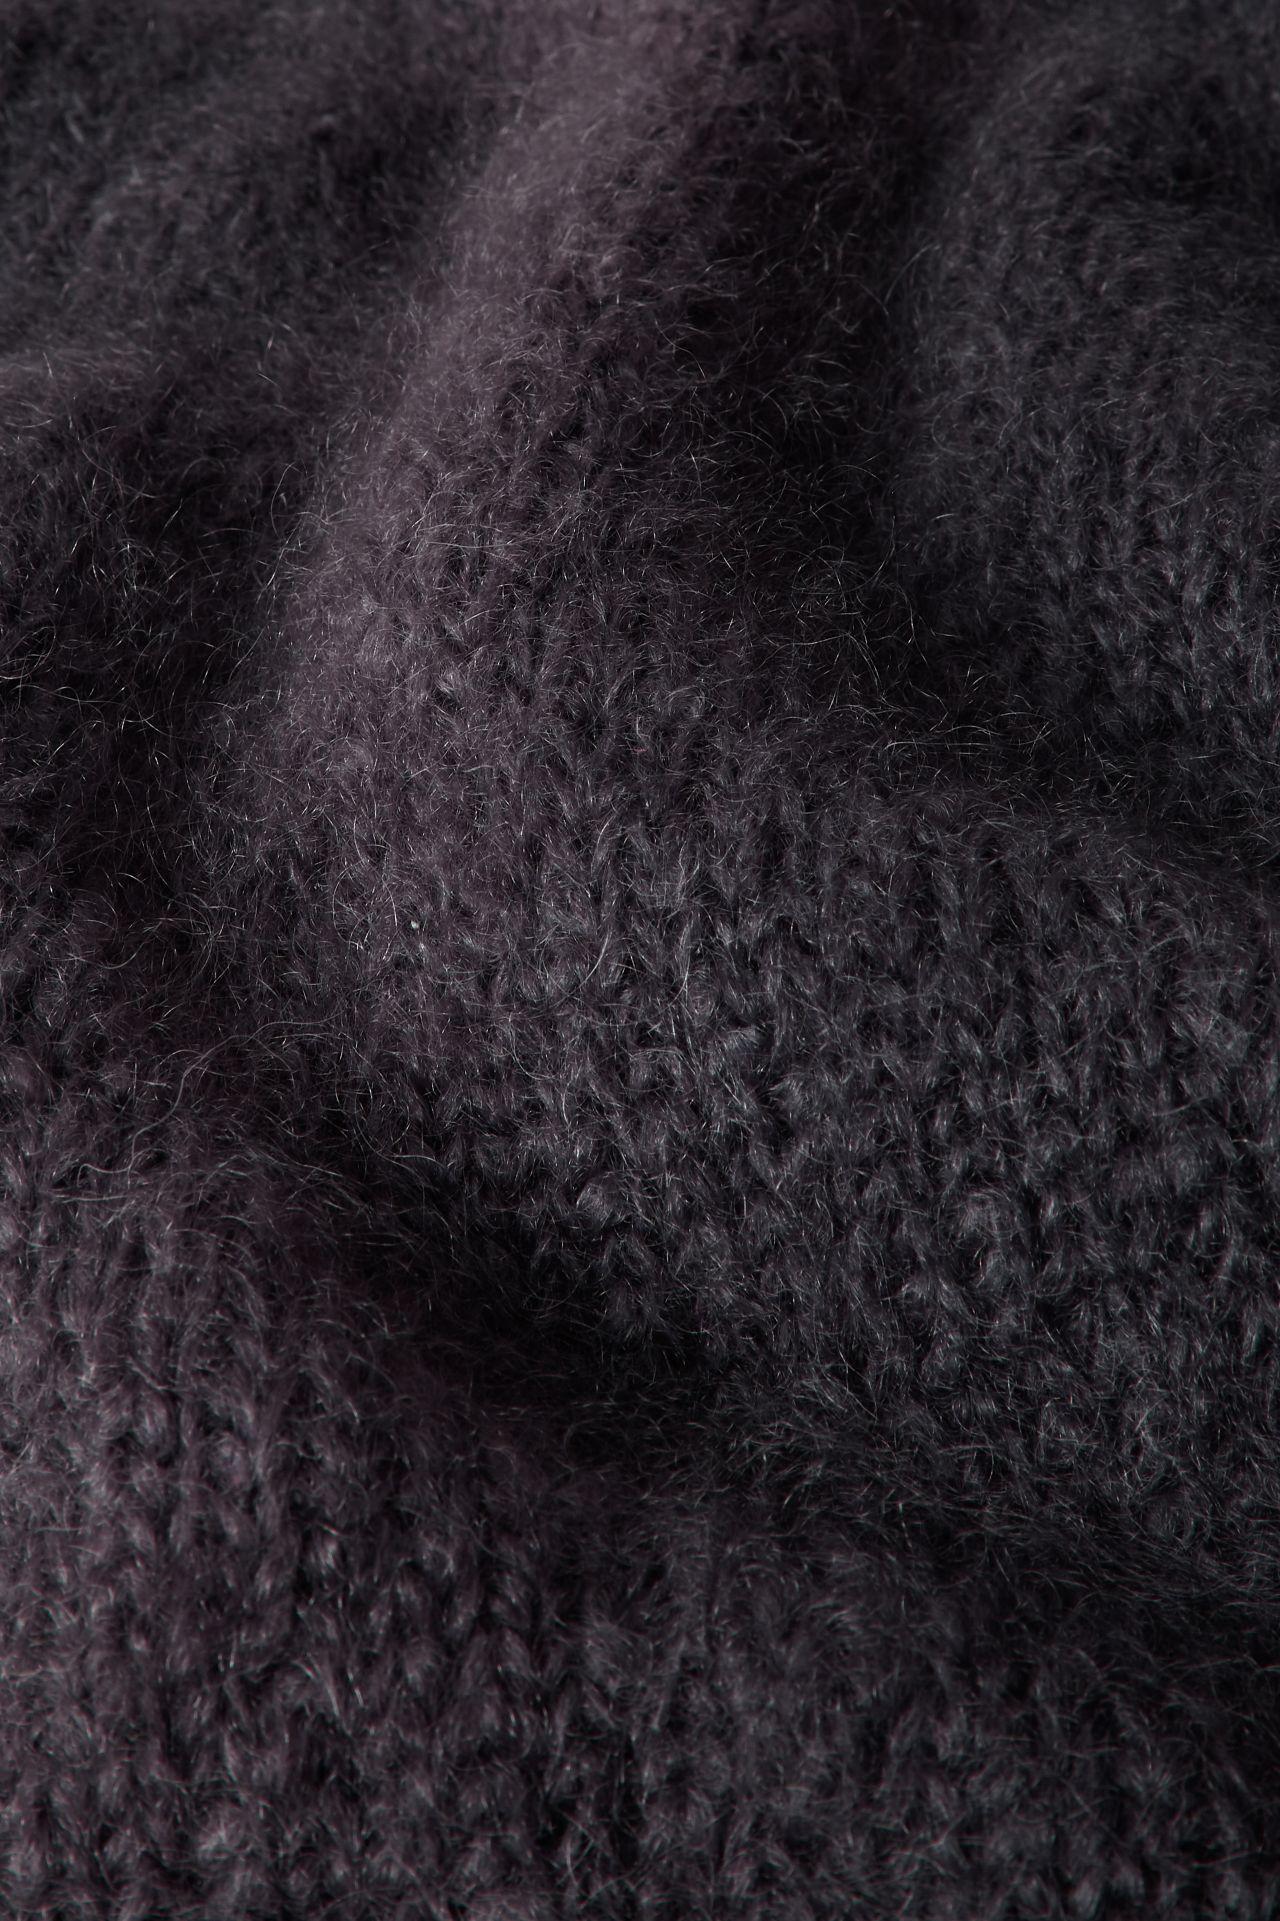 Mohair dark gray detail knit.